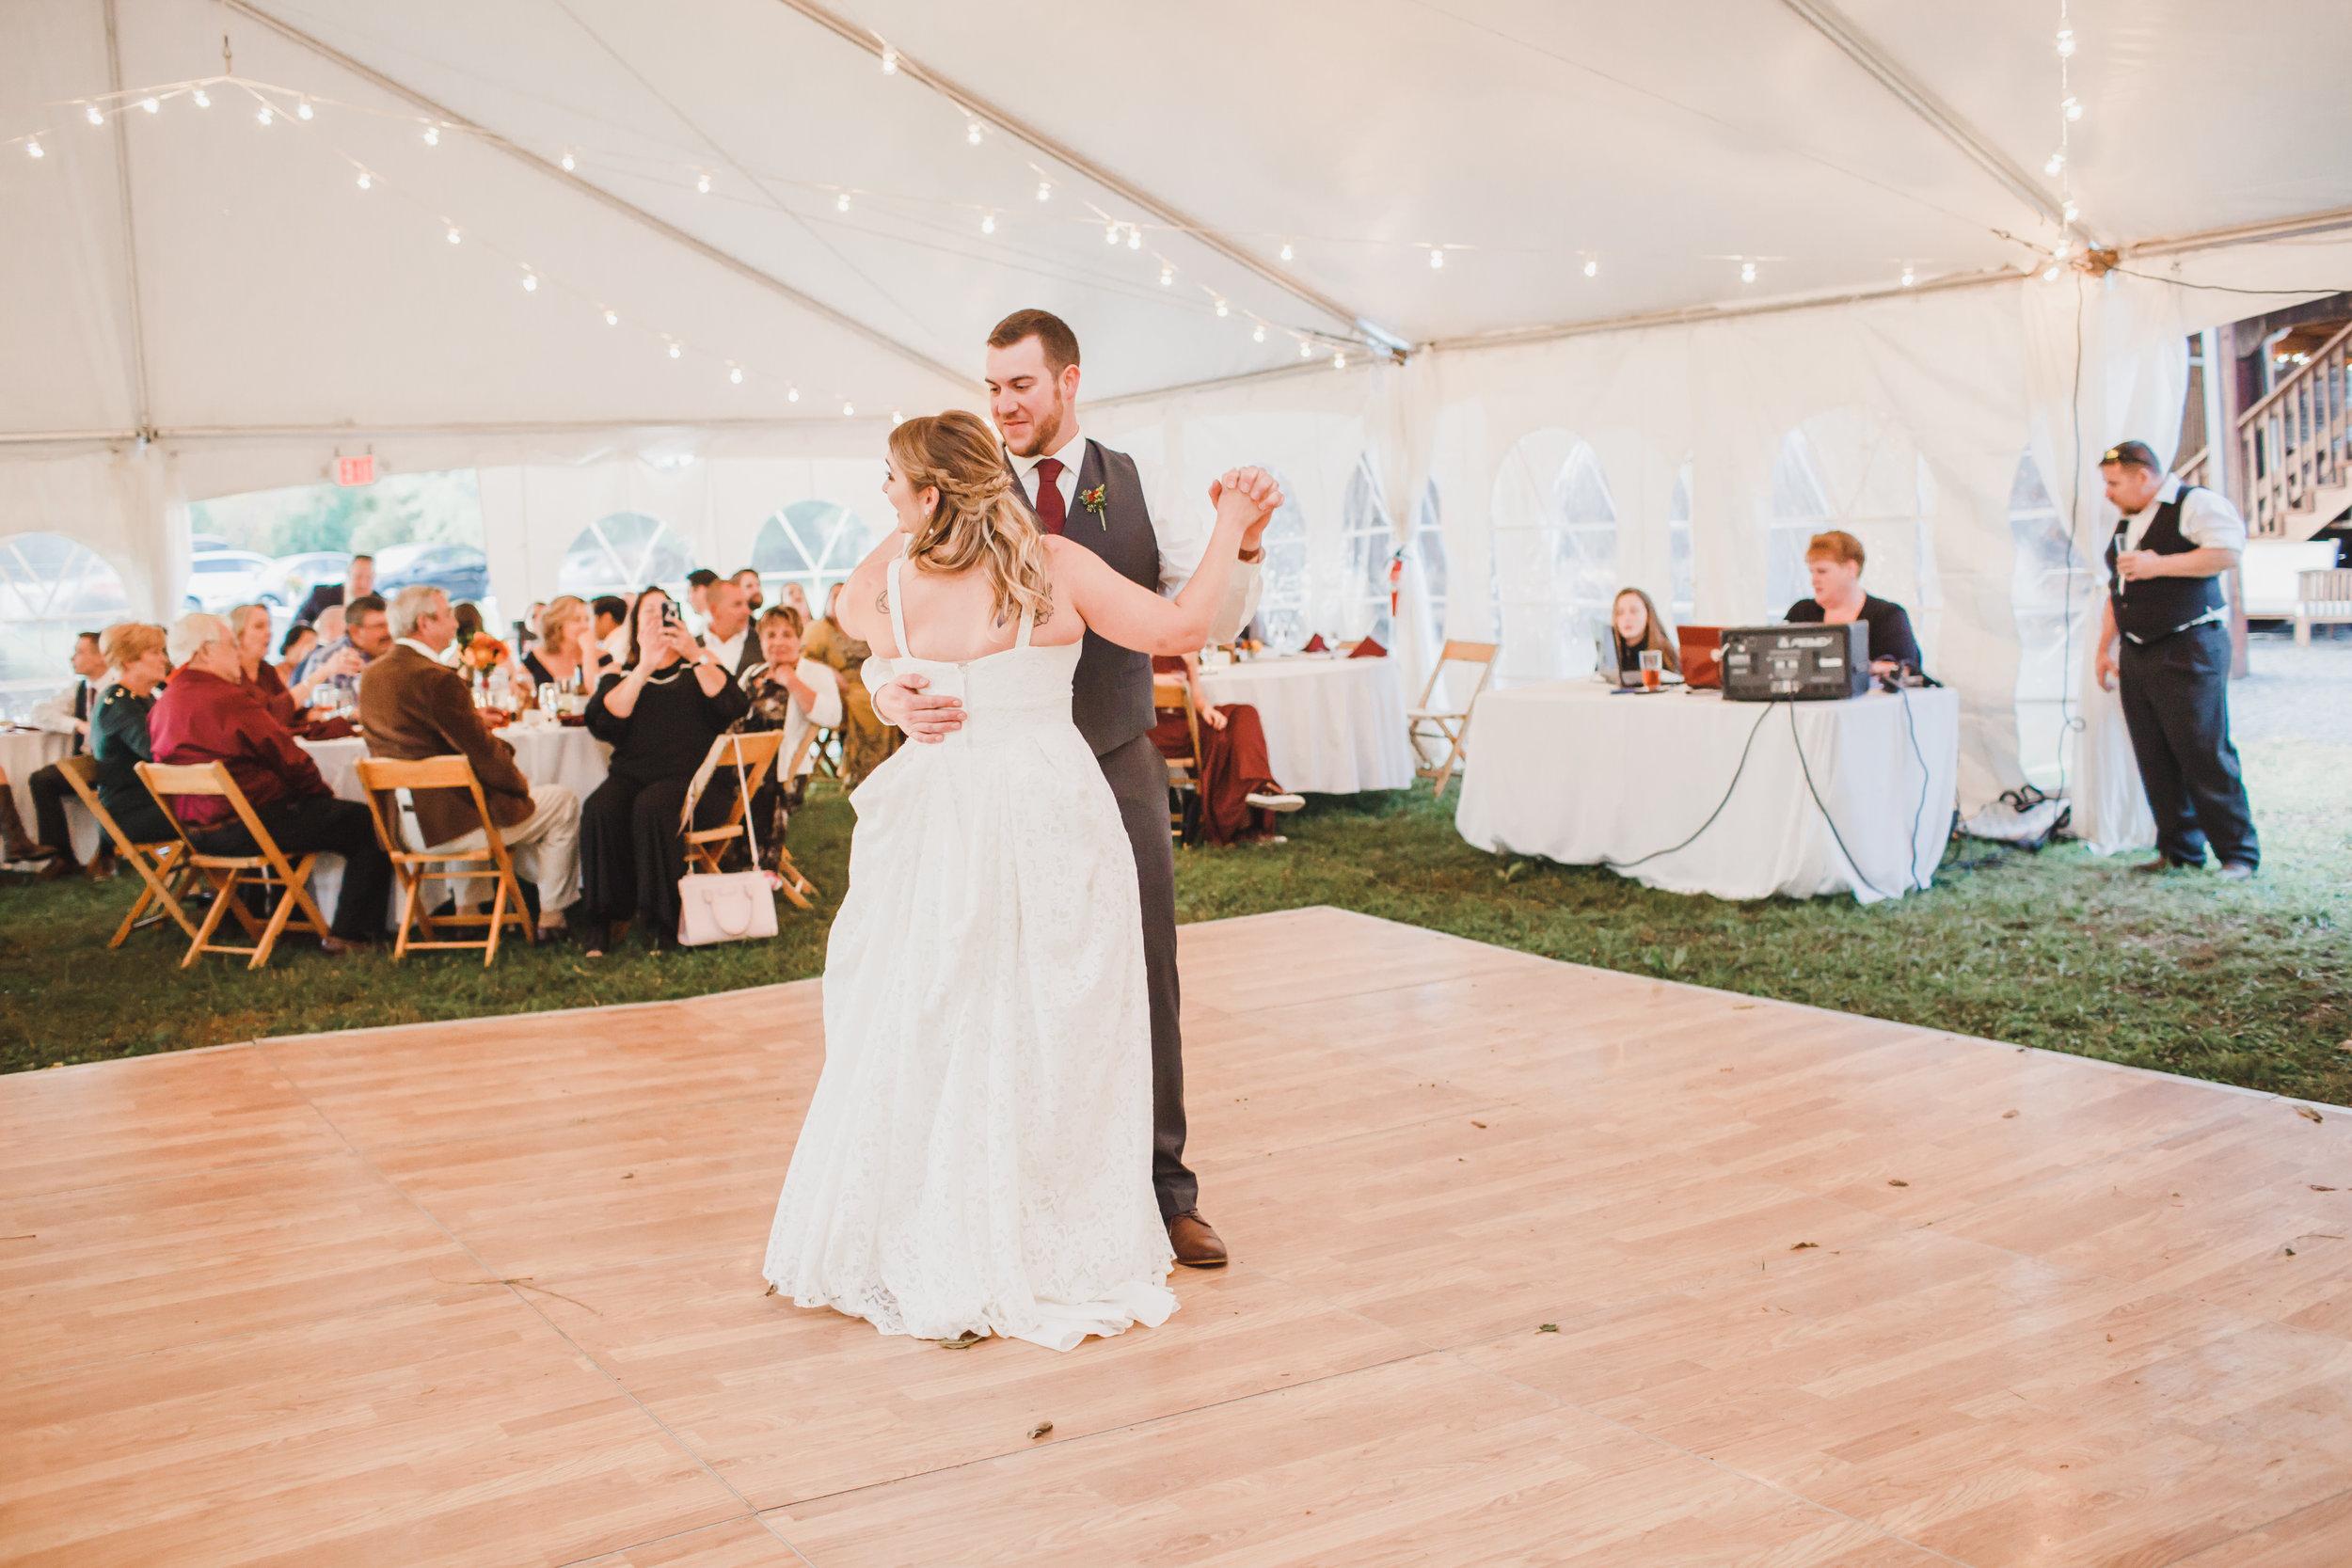 Fling - Virginia Wedding Photographer - Photography by Amy Nicole-4575-8.jpg